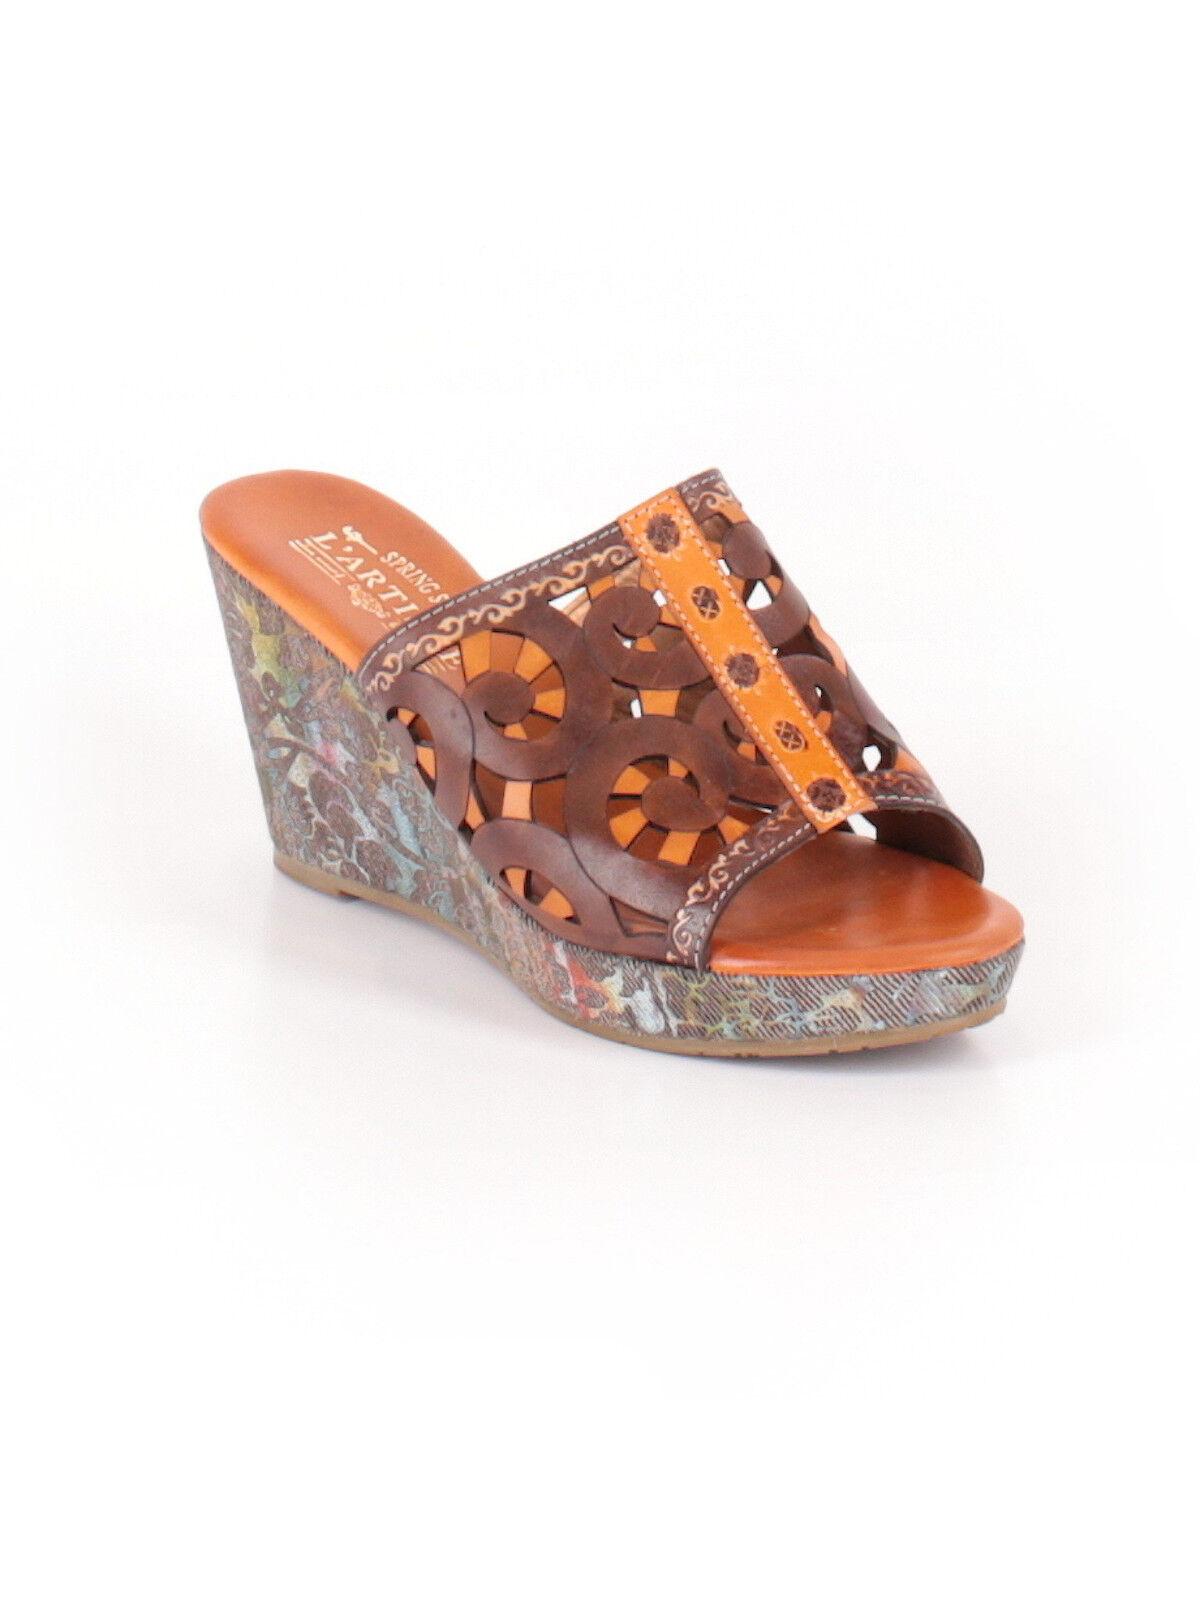 New damen damen damen L'Artiste Zoe Camel braun Wedge Slide Sandal Heel schuhe Größe 39 3f6442